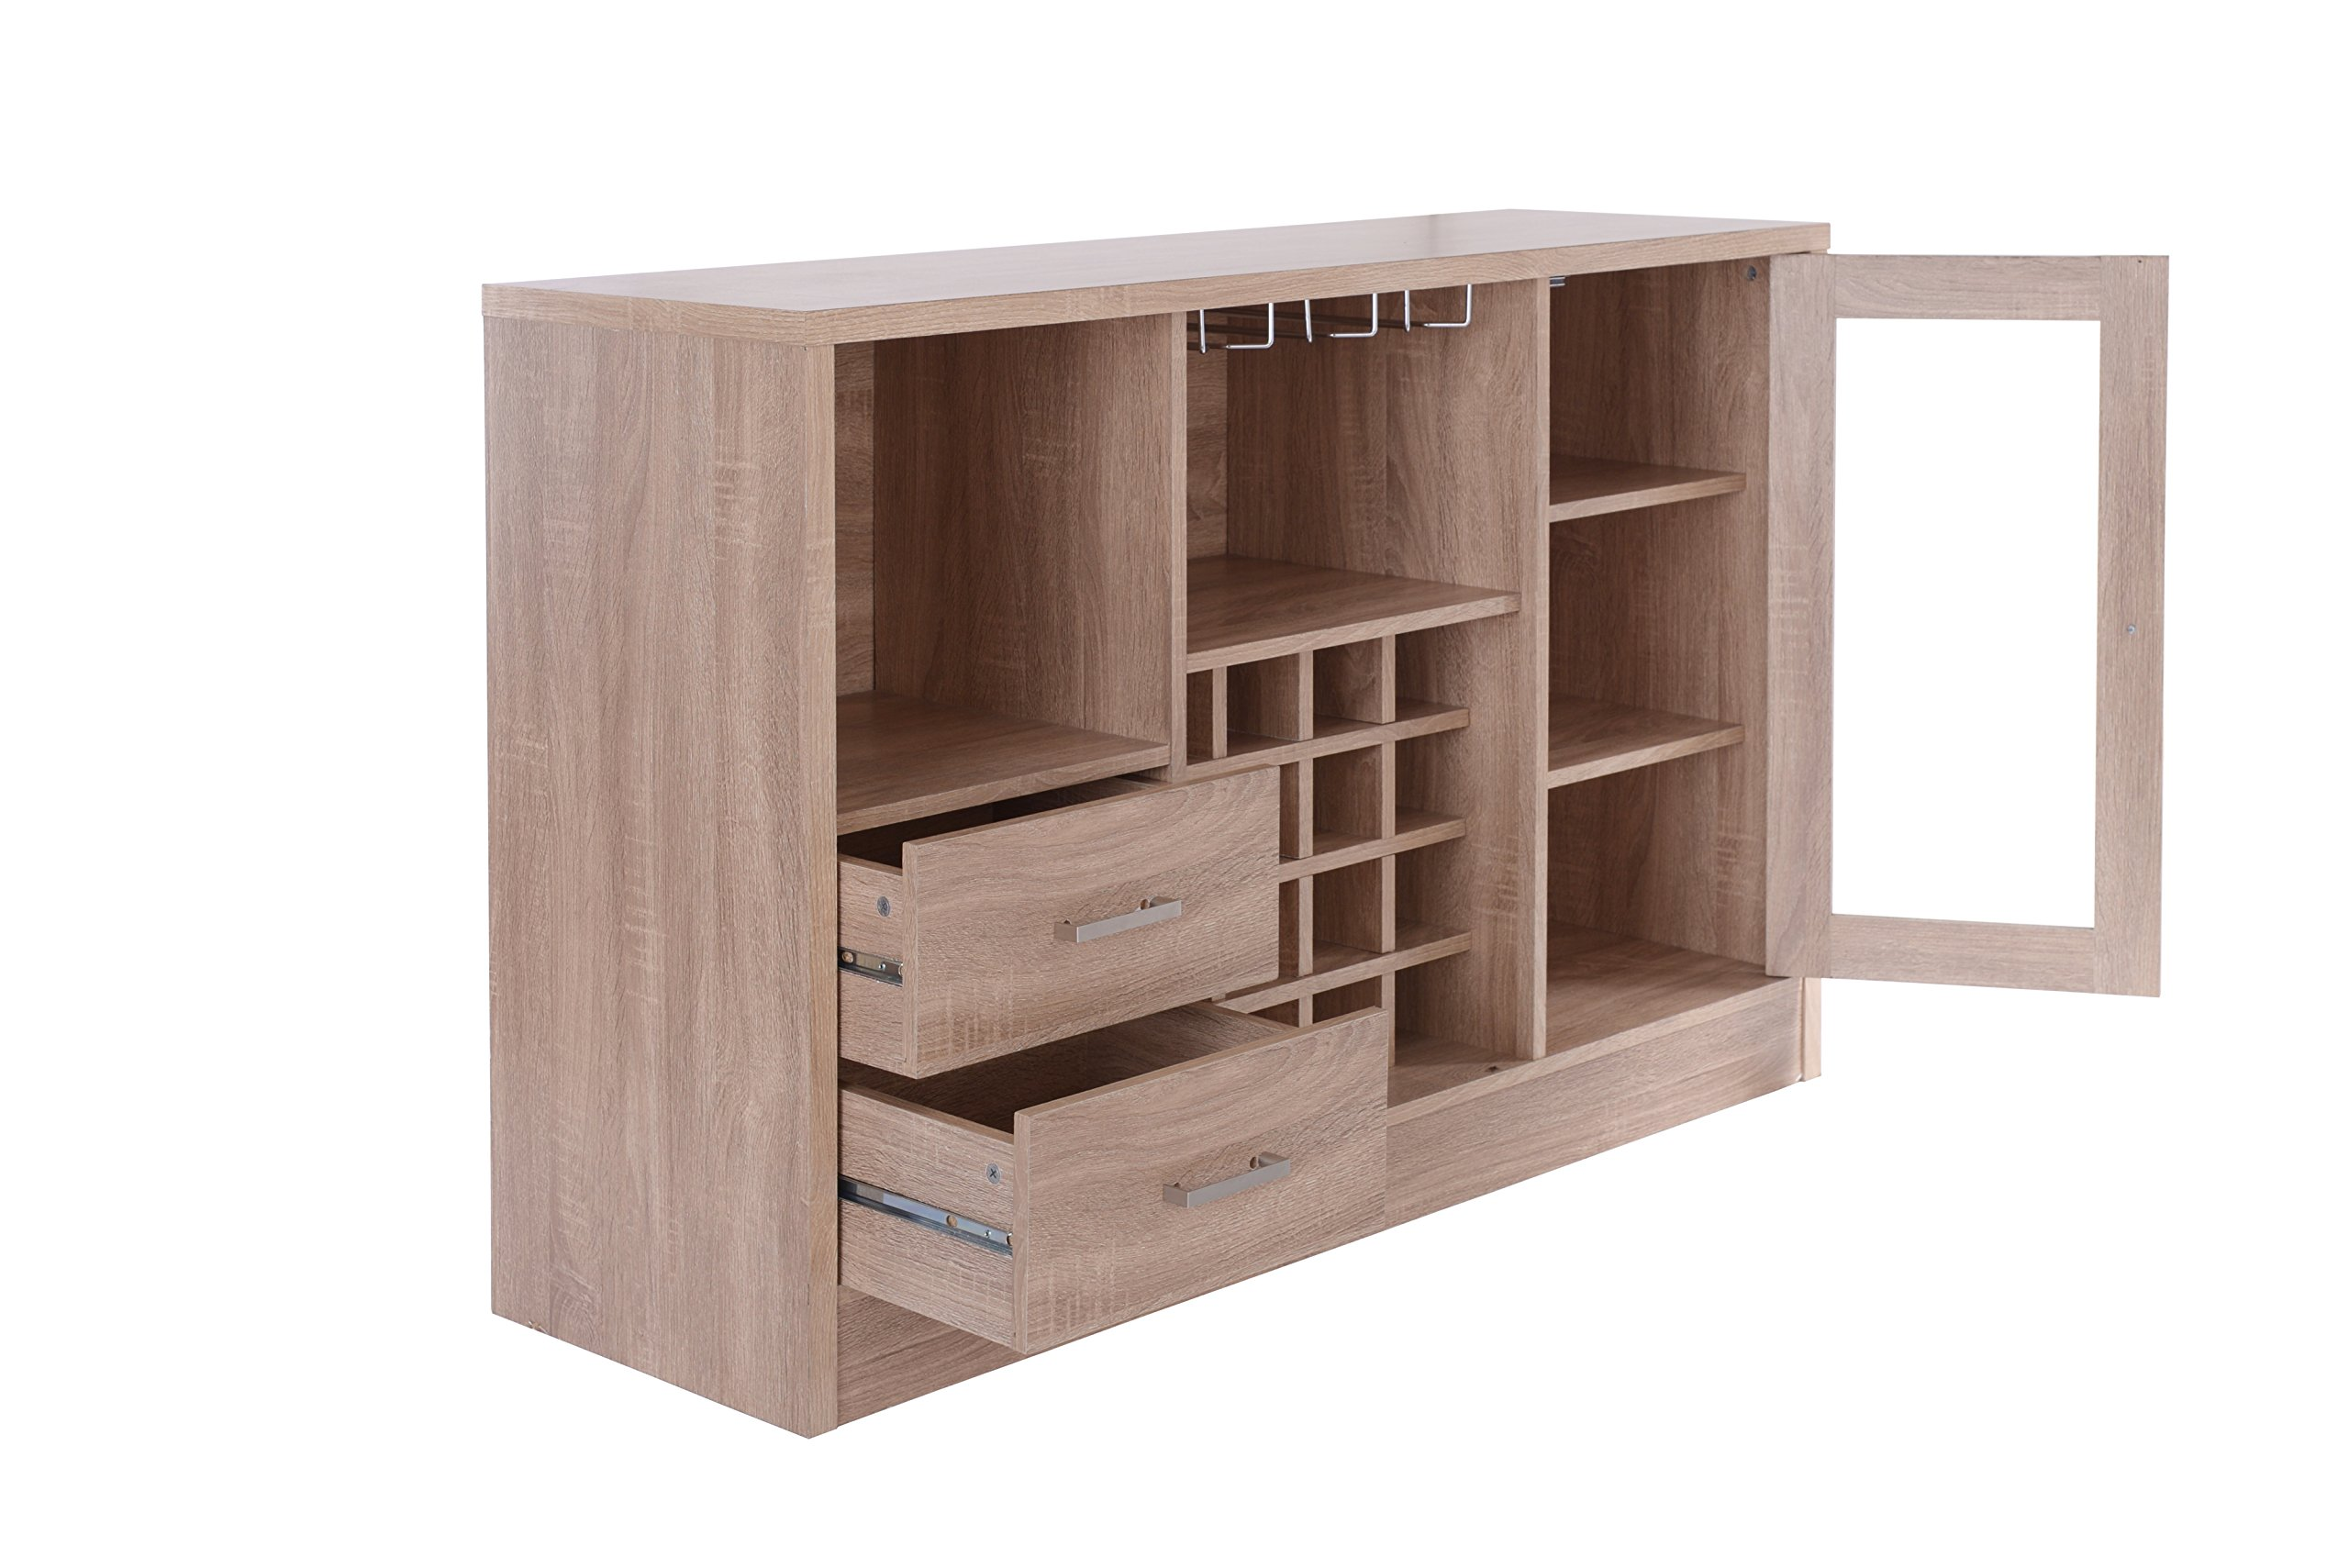 Acme Furniture 72635 Joice Rustic Oak Server by Acme Furniture (Image #5)